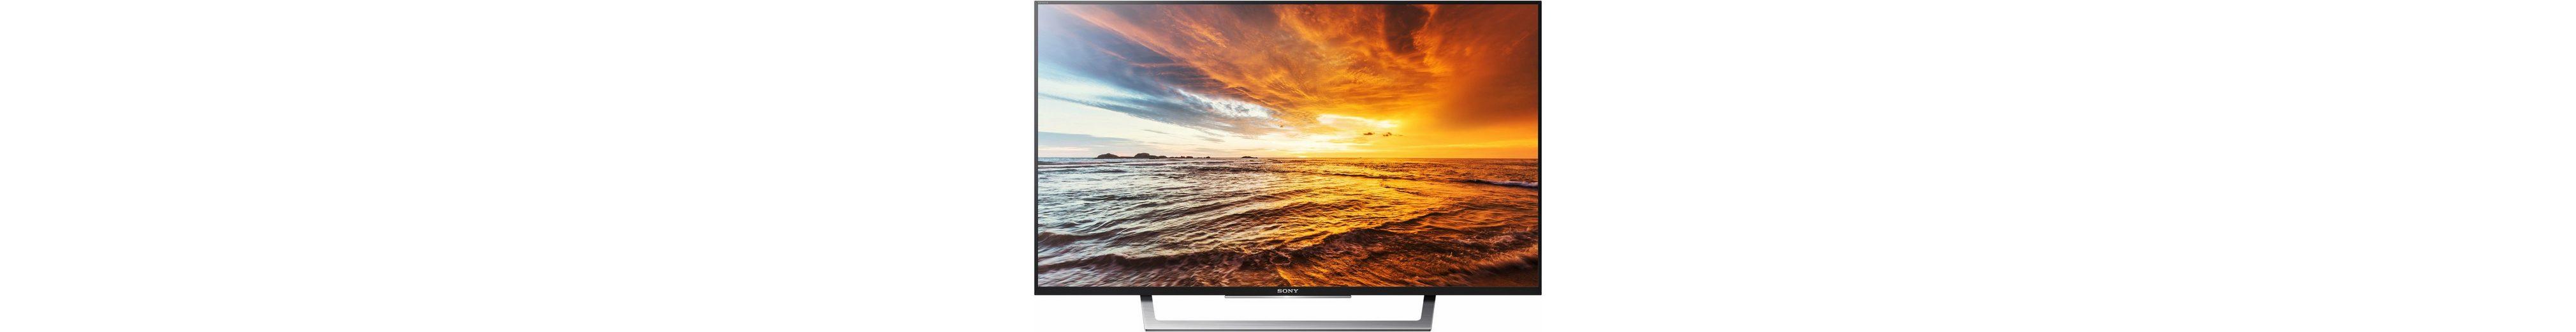 Sony KDL-32WD755, LED Fernseher, 80 cm (32 Zoll), 1080p (Full HD), Smart-TV